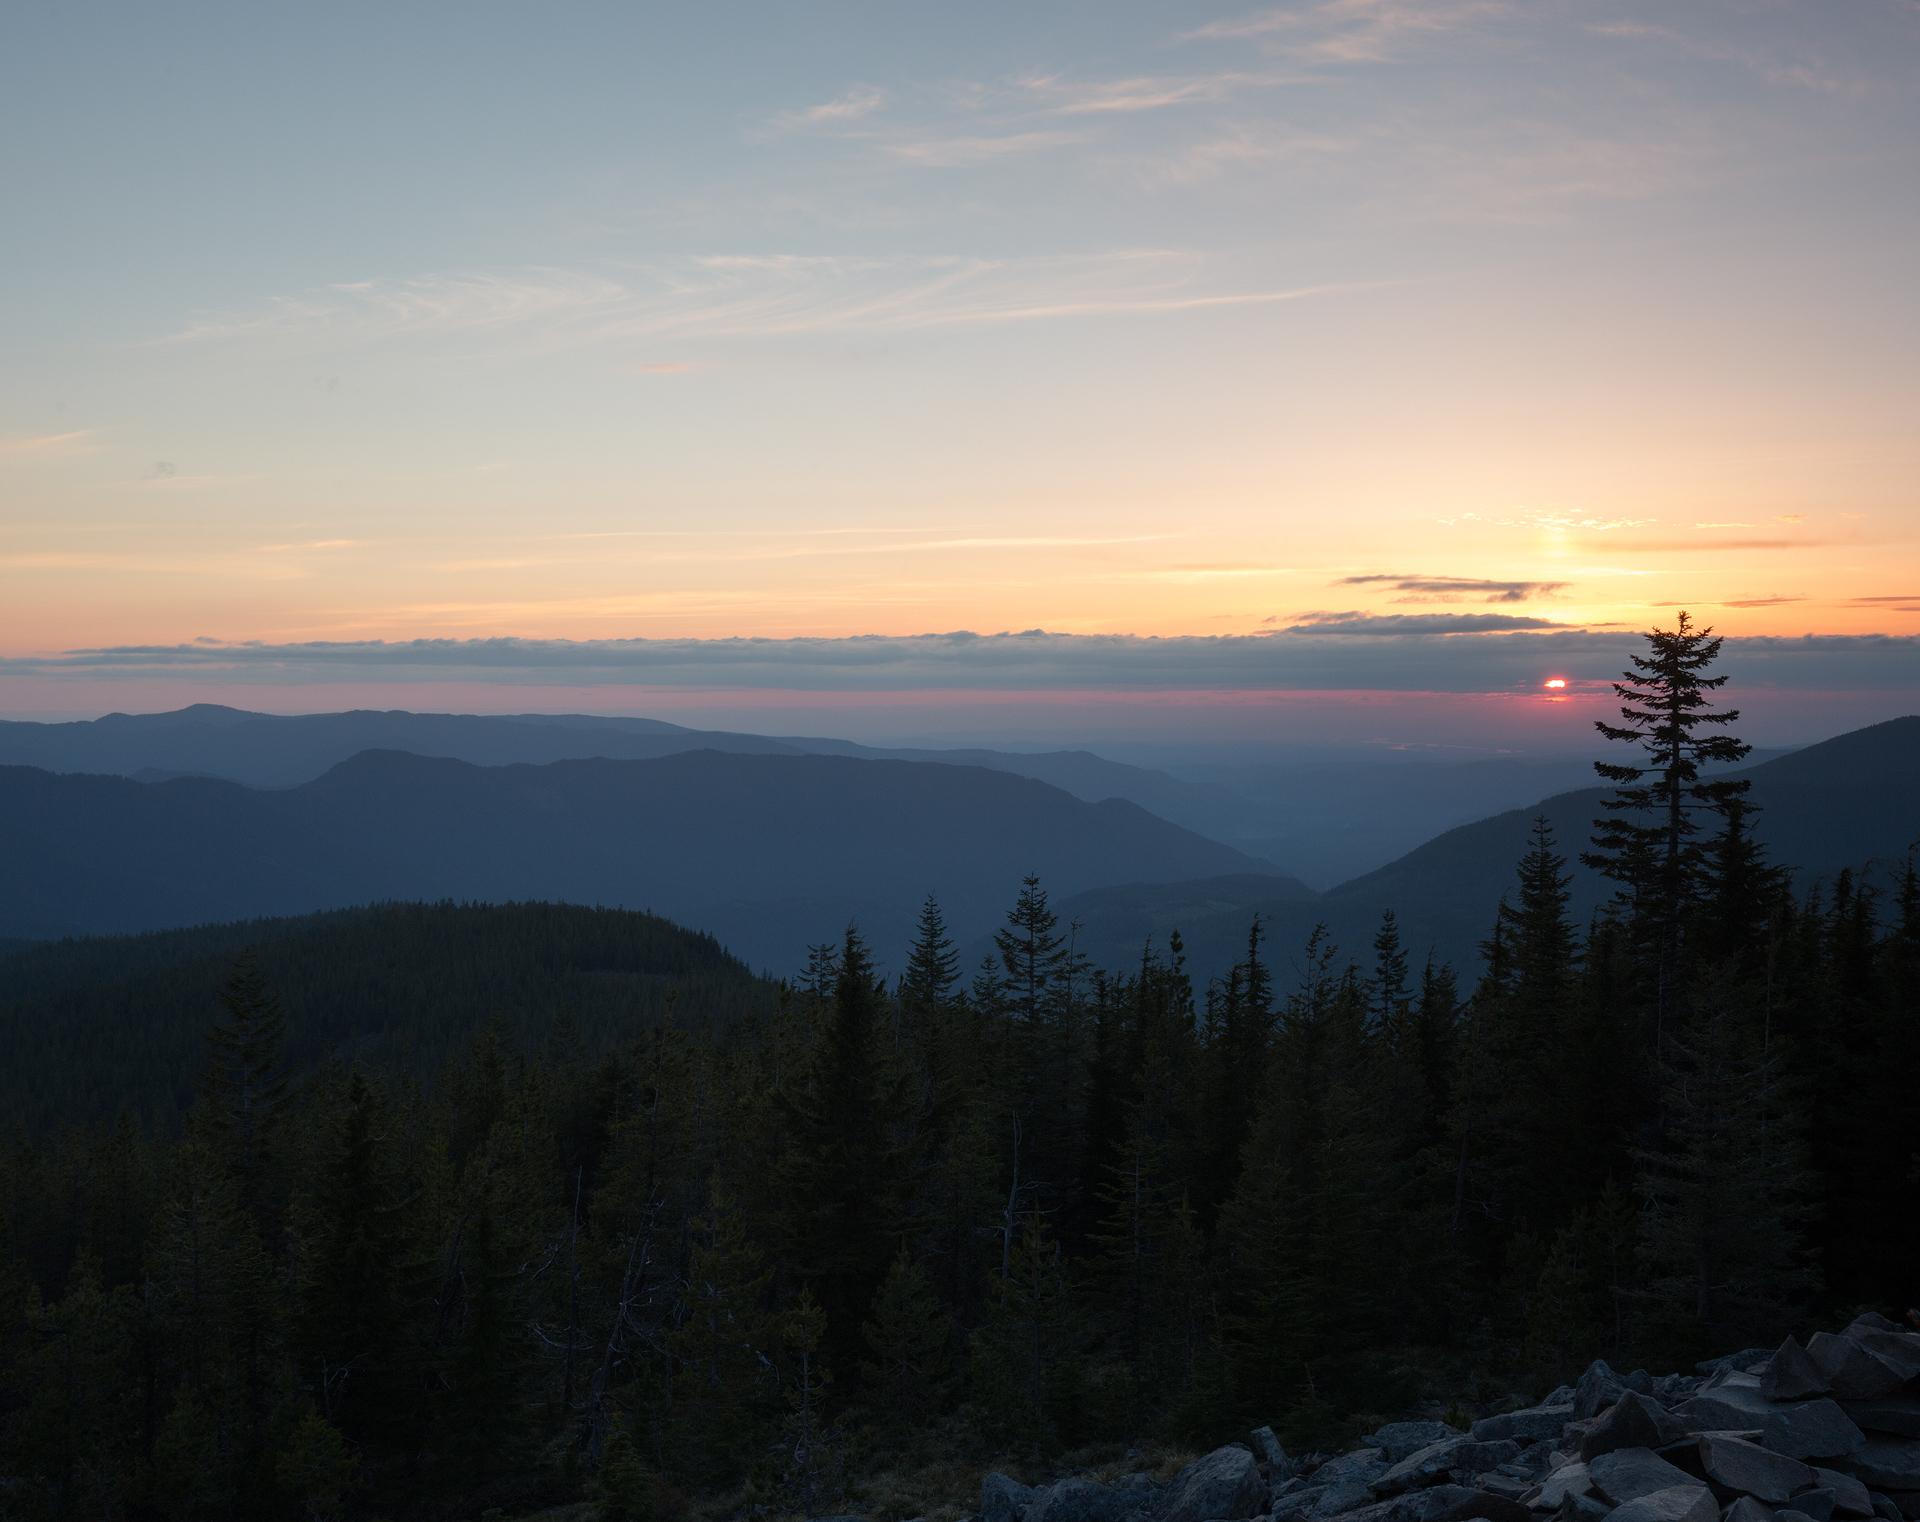 the national parks girl_oregon_mt hood_sunset_canon_forest_national forest.JPG